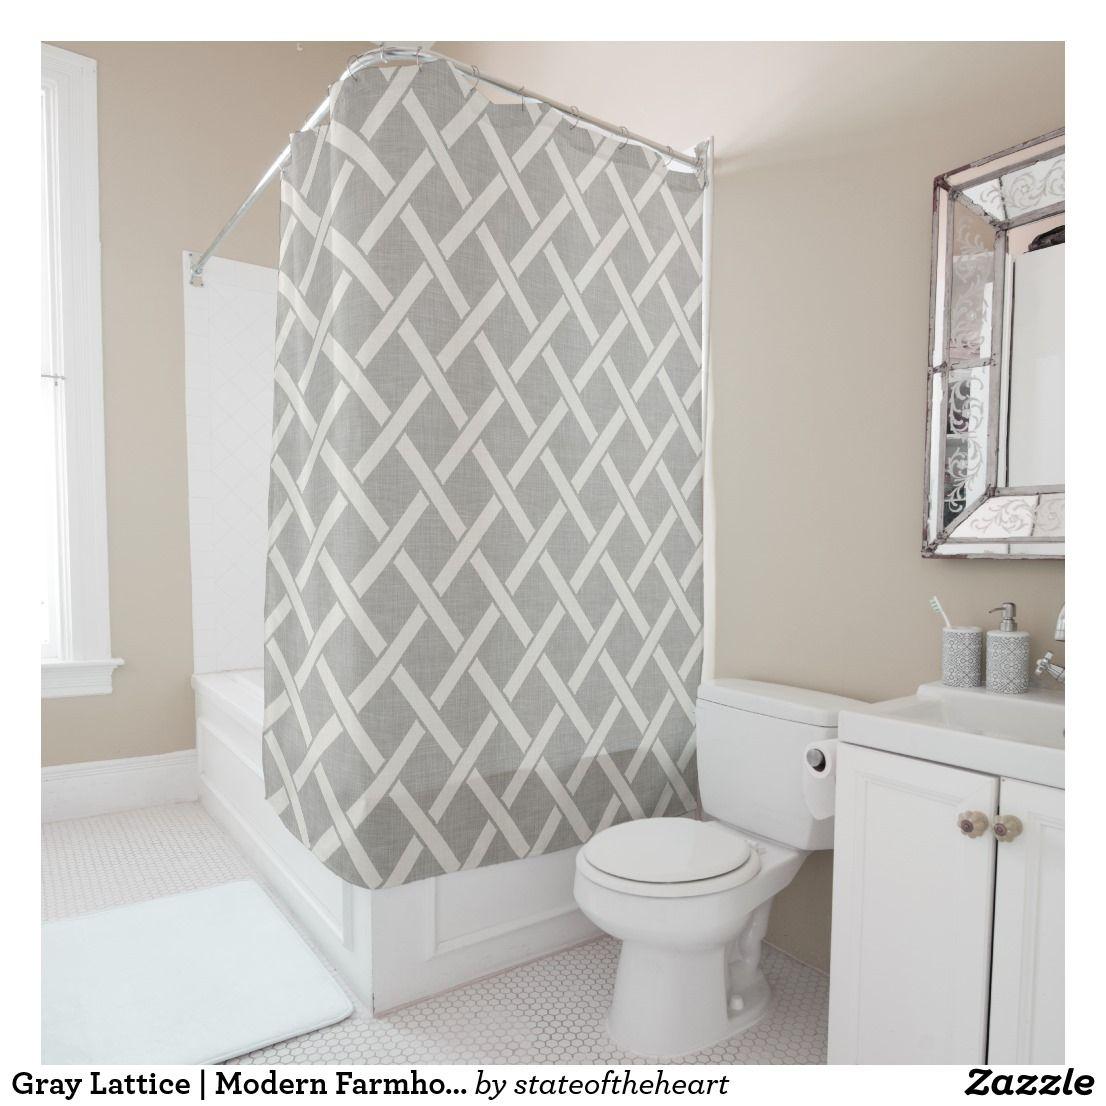 Gray Lattice Modern Farmhouse Bathroom Decor Shower